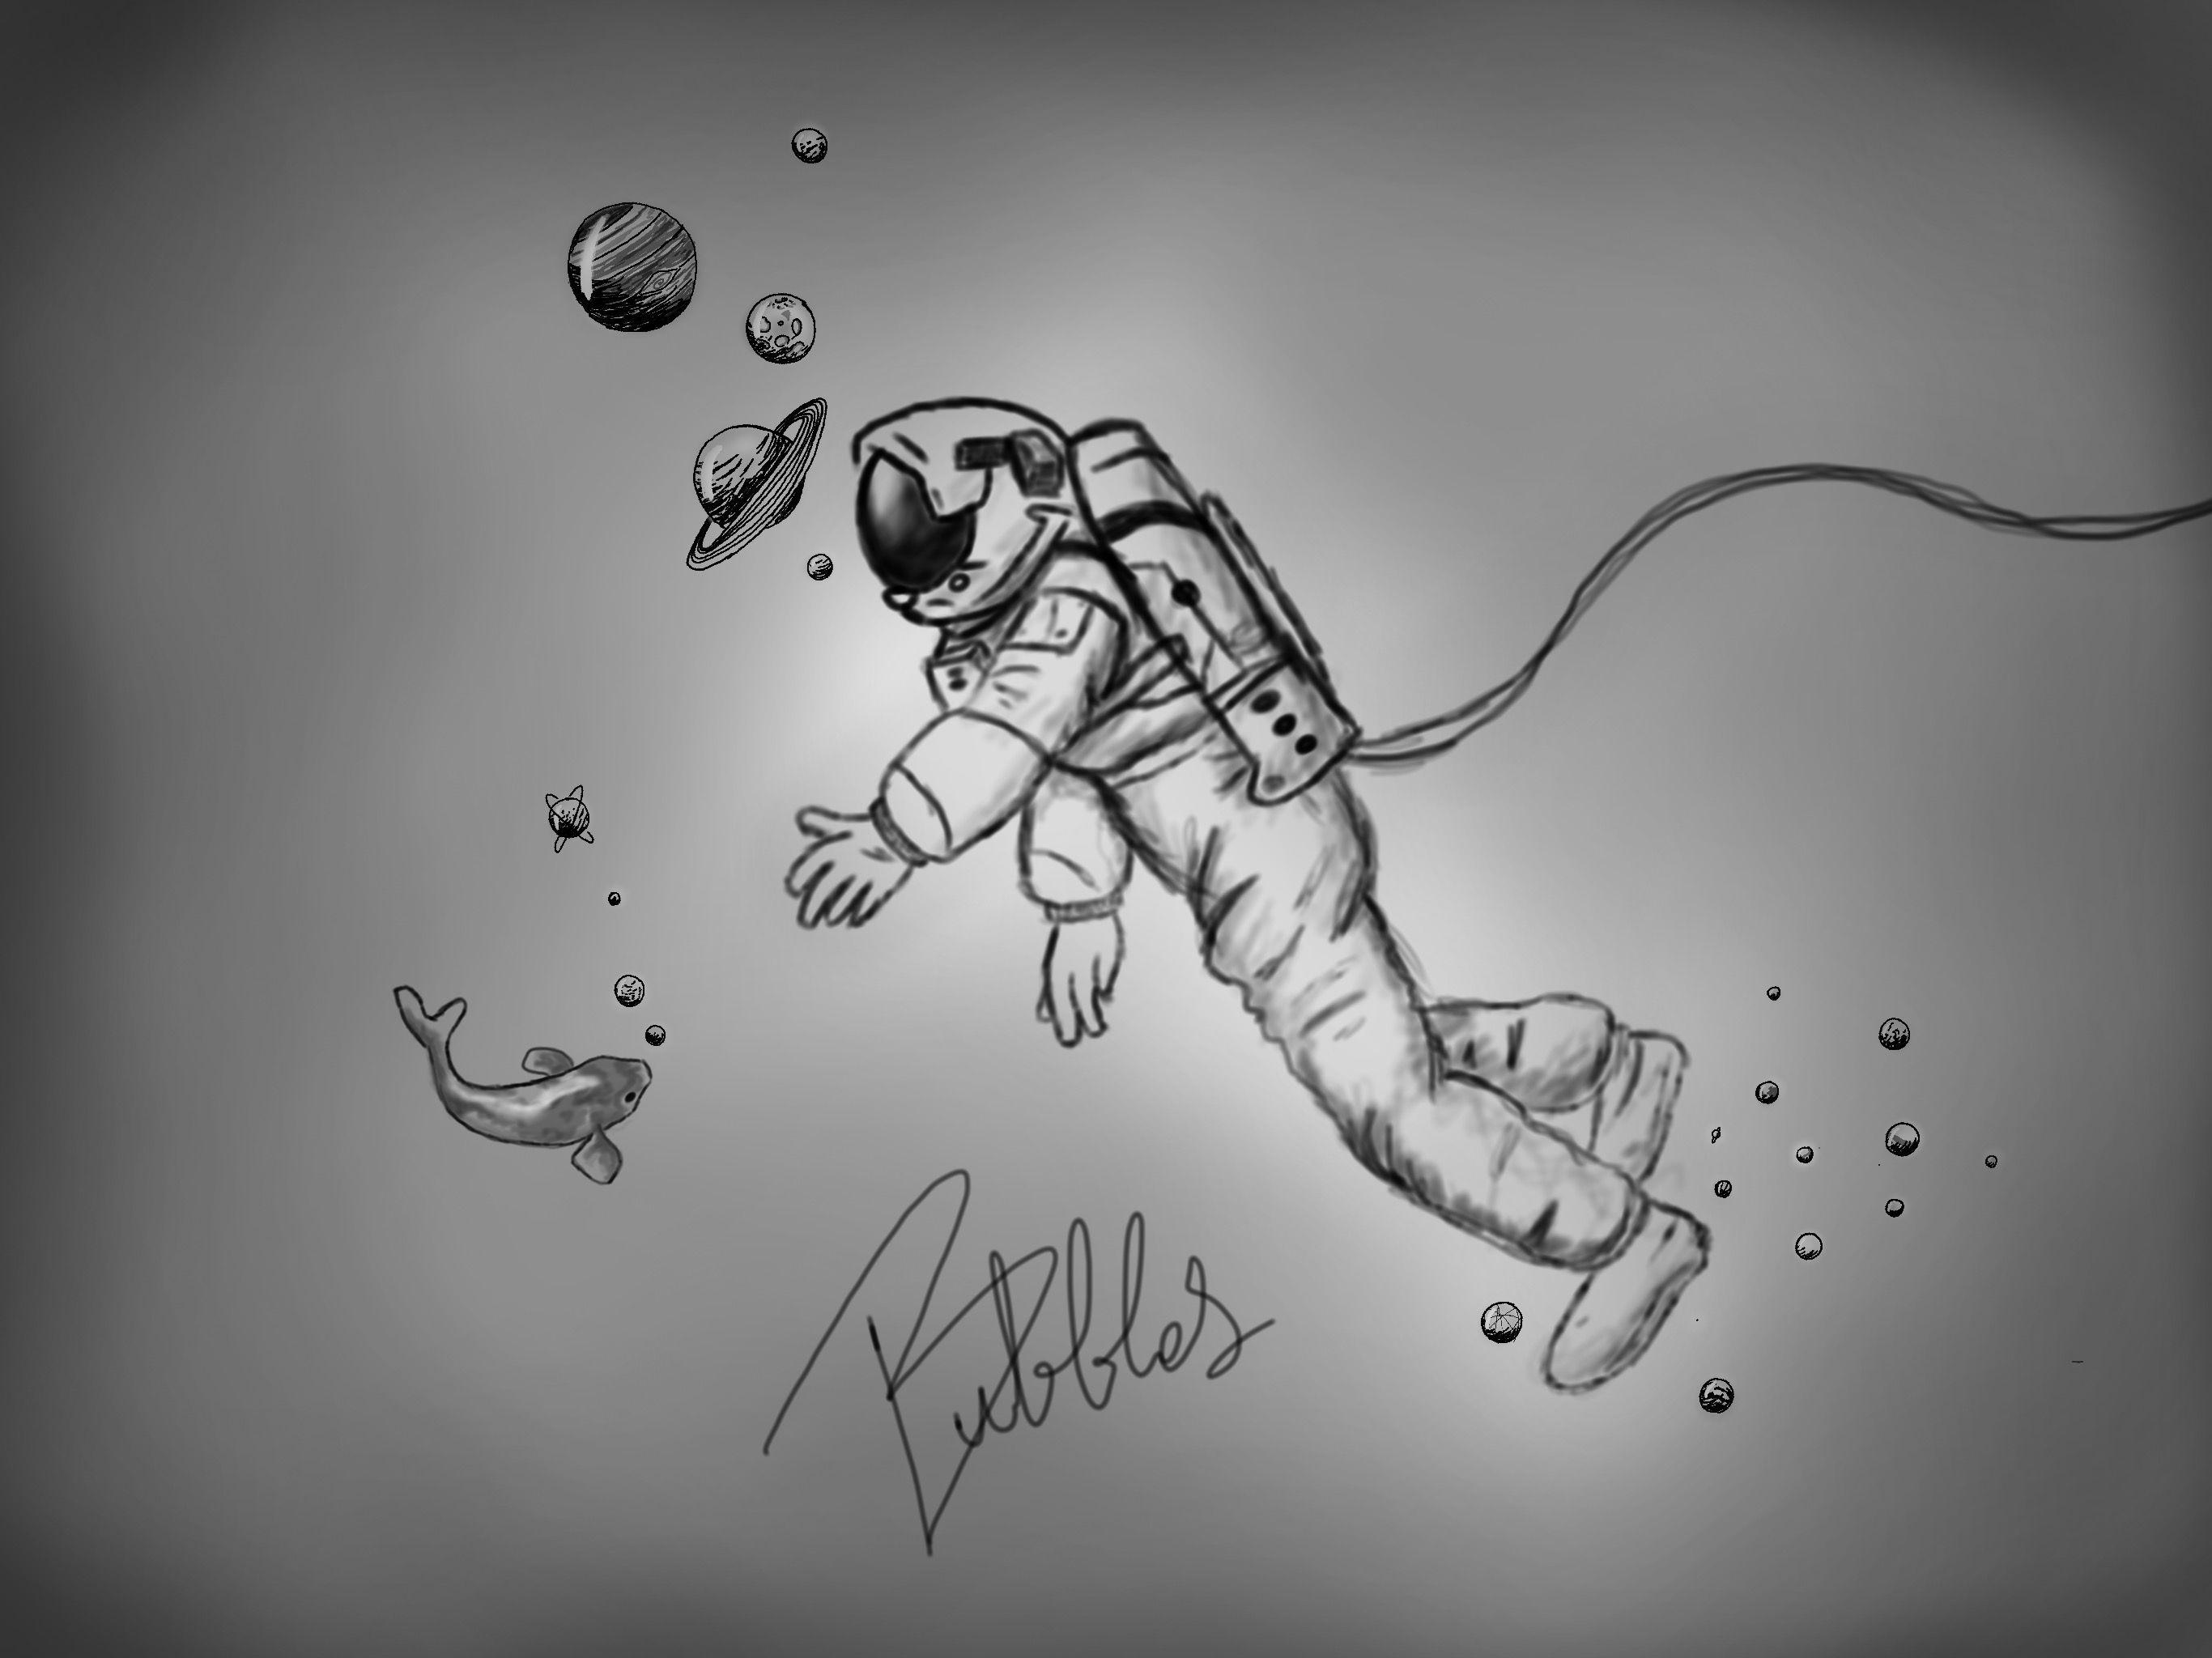 break dancing astronaut drawing - HD2732×2048